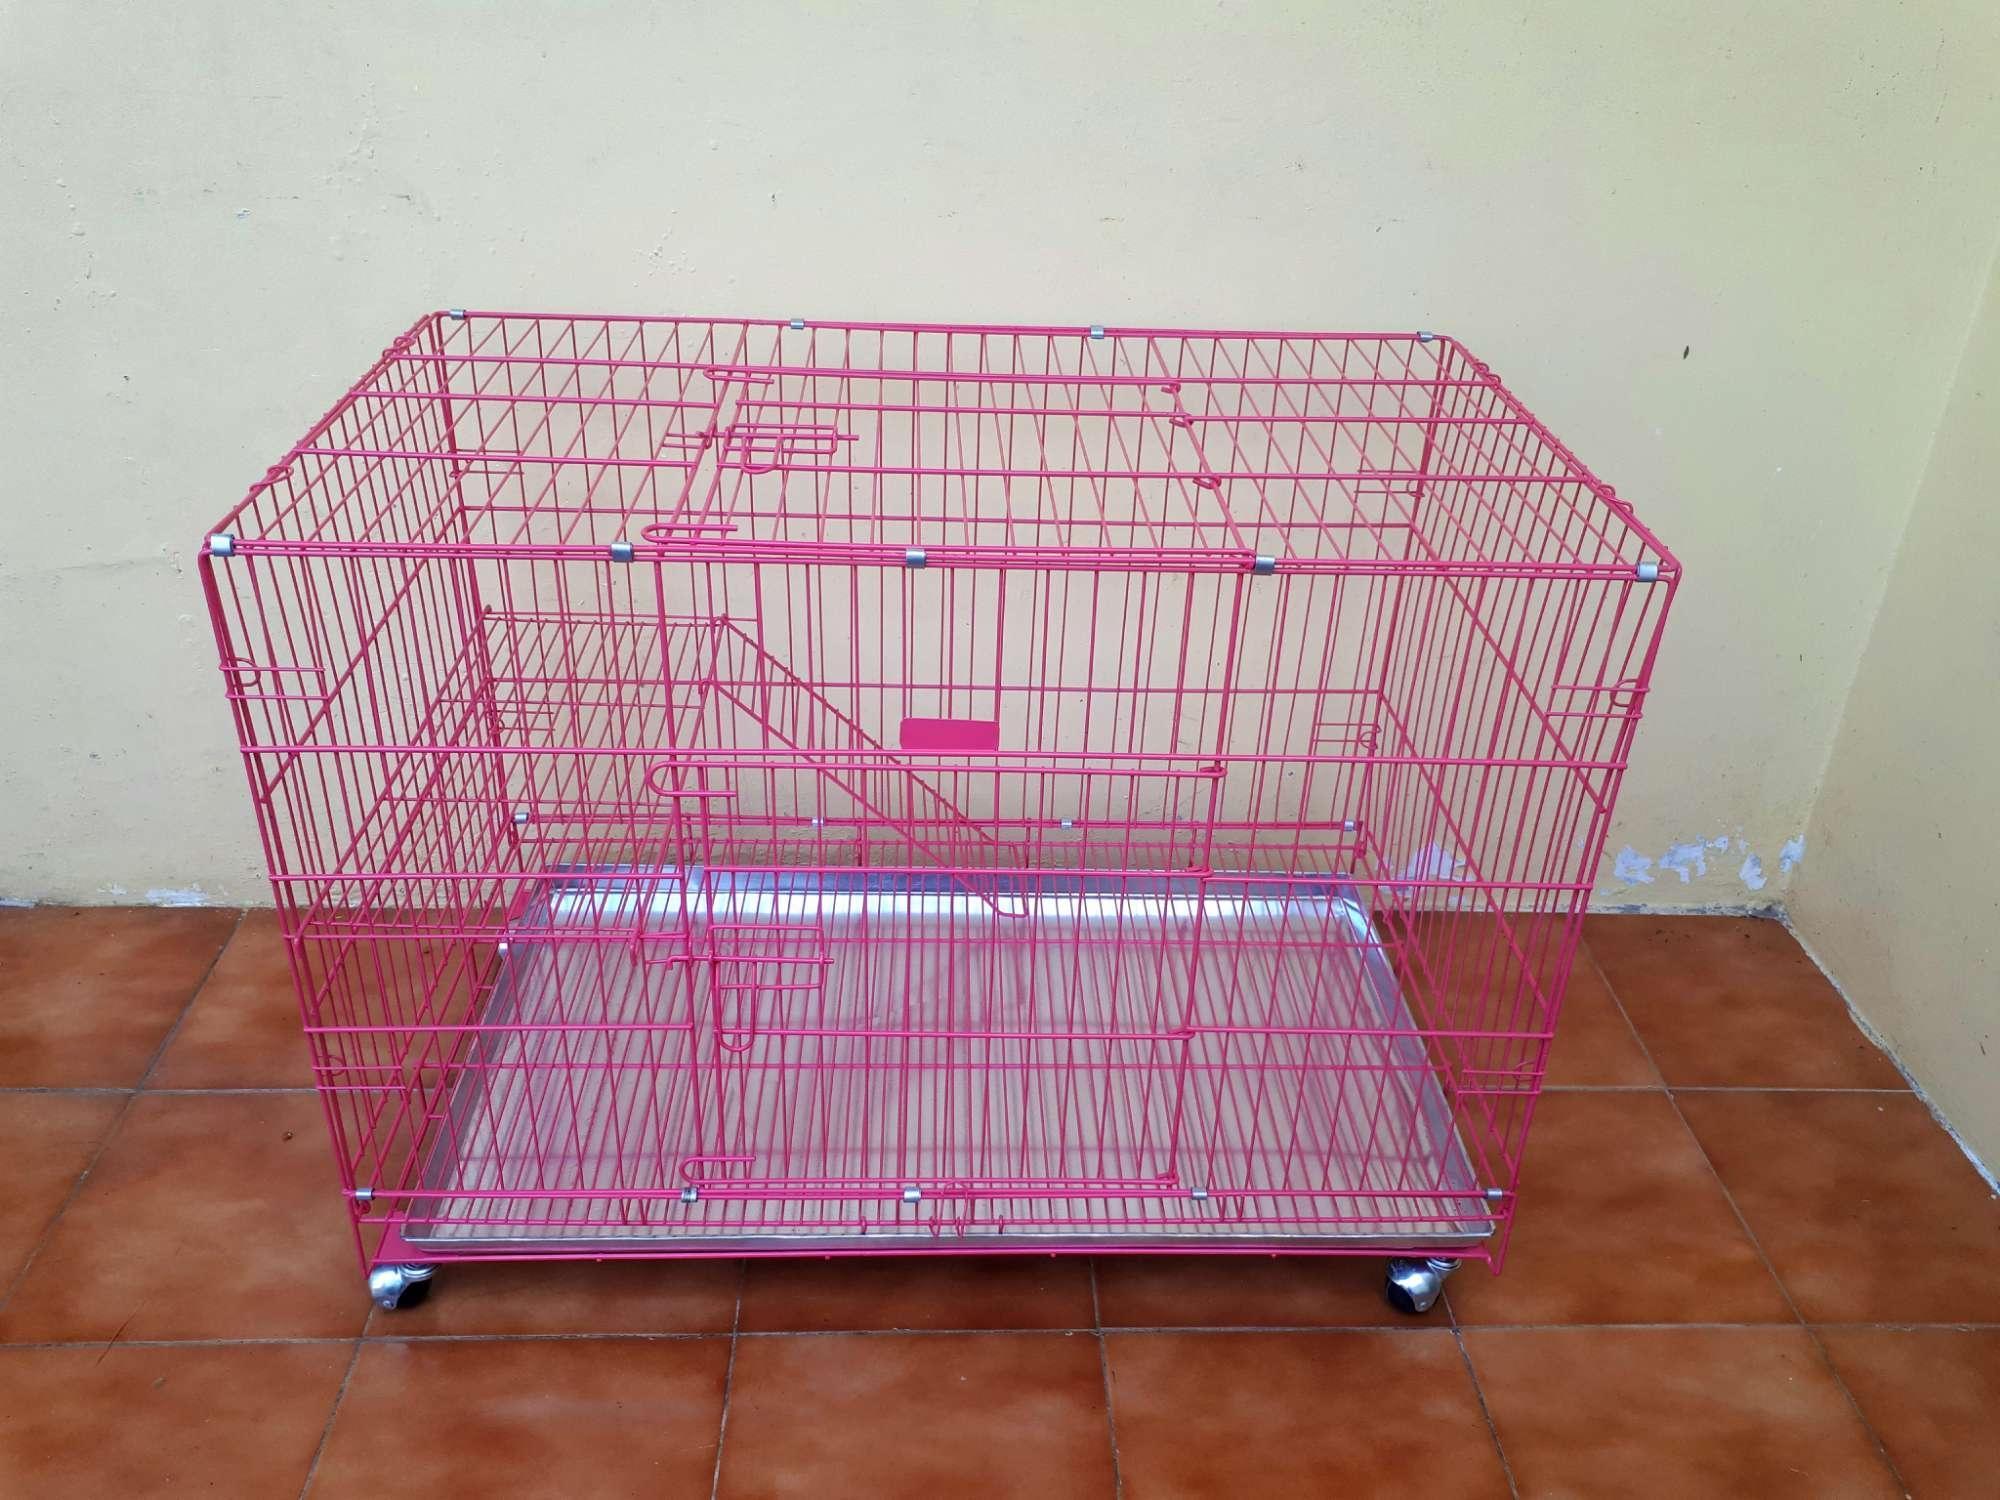 Kandang Tingkat Besar Besi Tebal Lipat Size XXL 95×63×55 Kucing Anjing Kelinci